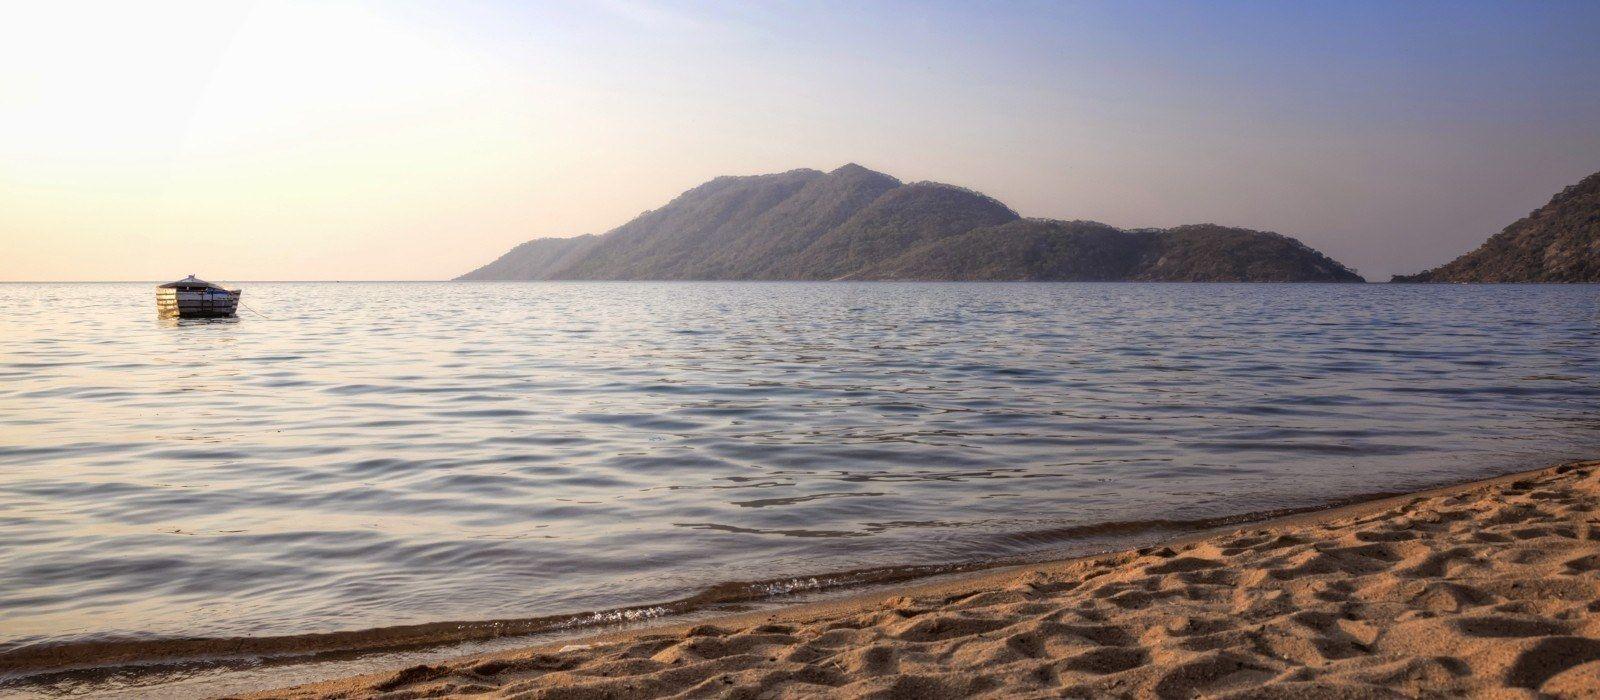 Destination Lake Malawi – Southern Lakeshore Malawi